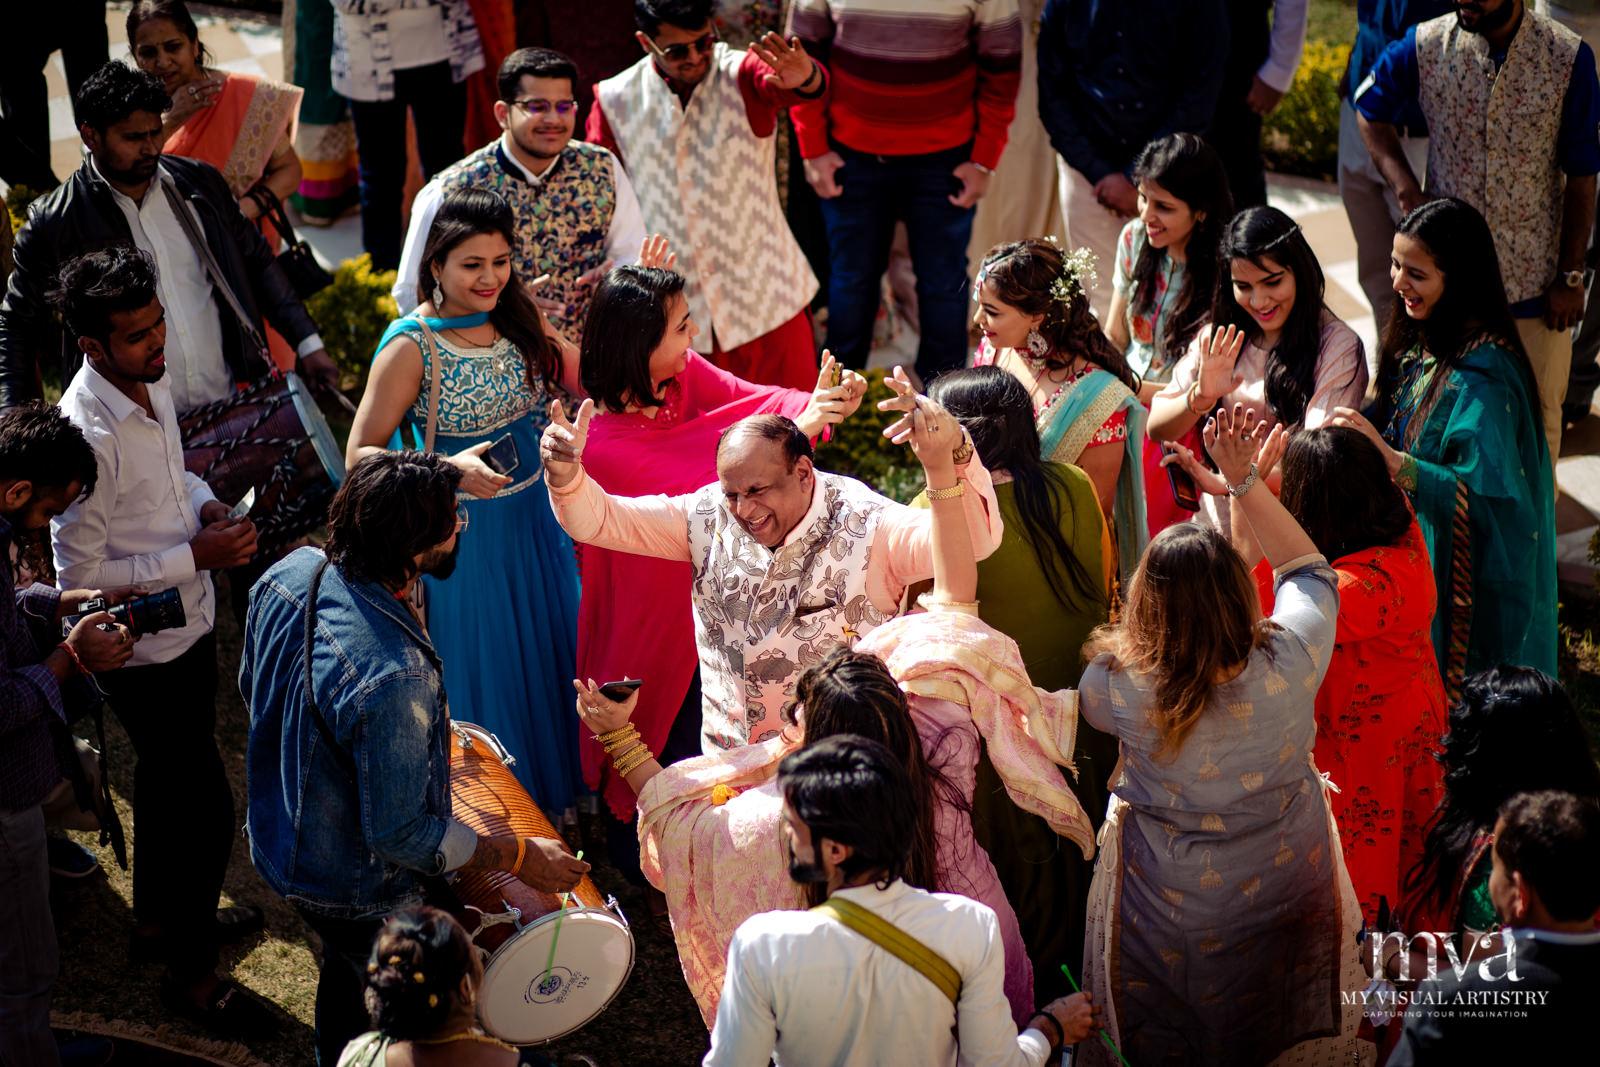 0328 -Vani_Sarang_ Photographer_My Visual Artistry_Wedding_MVA_Destination-6981.jpg